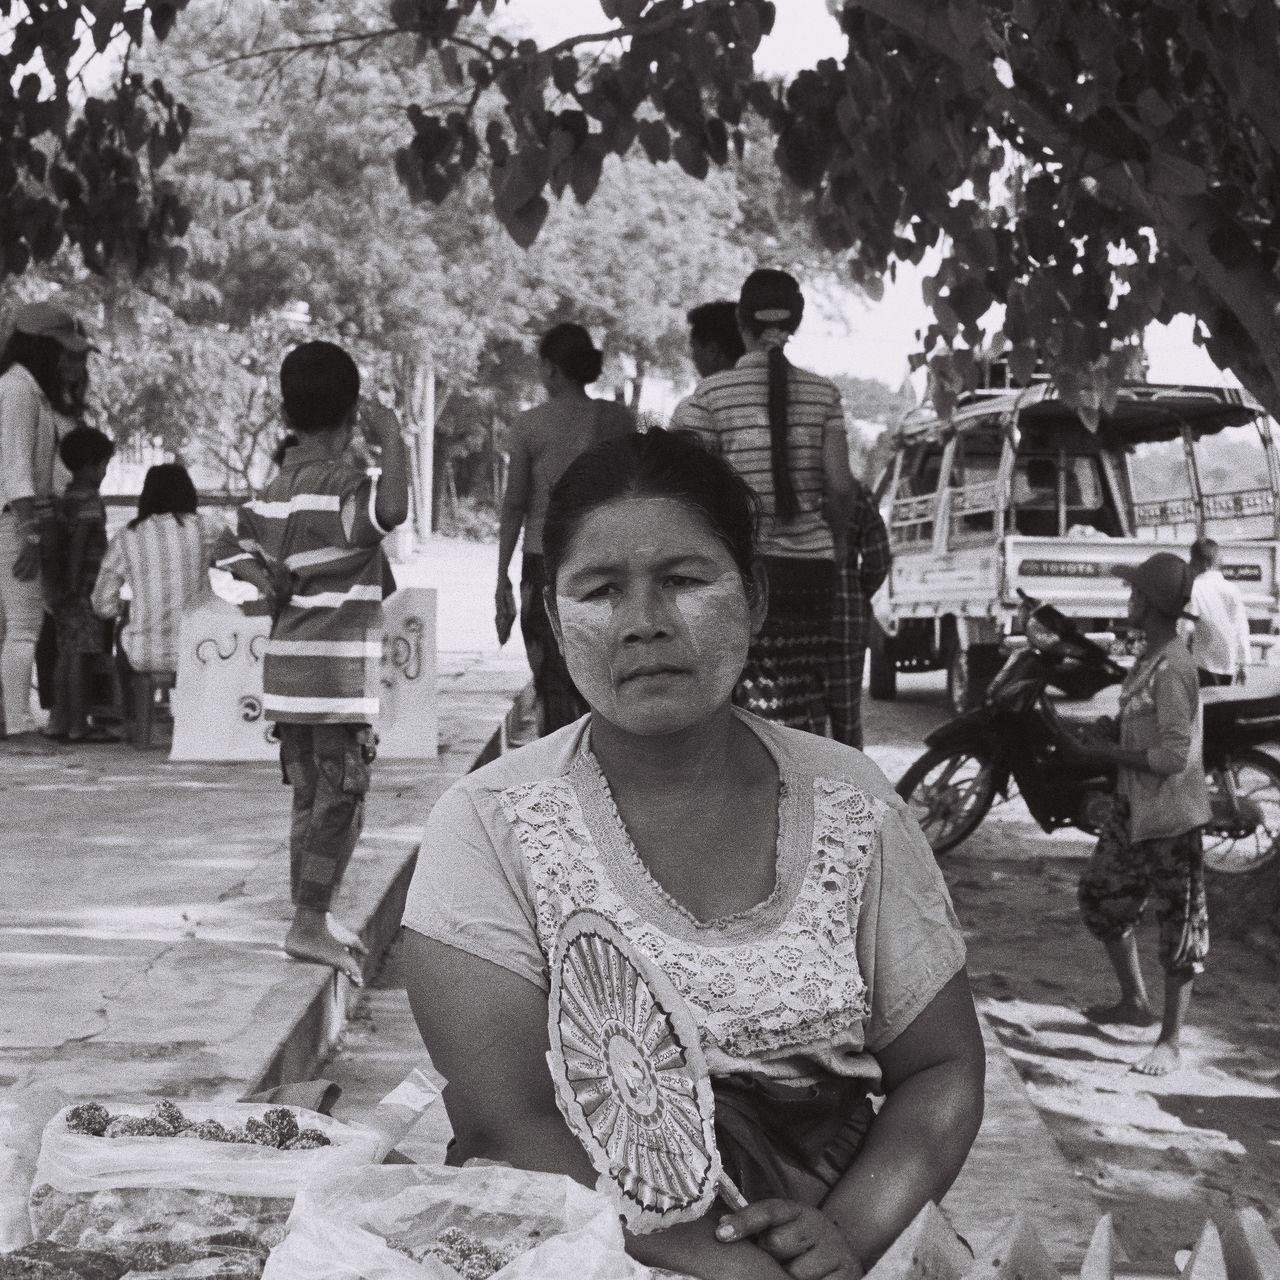 The Street Photographer - 2017 EyeEm Awards The Photojournalist - 2017 EyeEm Awards The Portraitist - 2017 EyeEm Awards Travel Destinations Black And White Real People Religion Portrait Lifestyles Iusefilm Ishootfilm 35mm Ilfordpan400 Backandwhite Bagan Bagan, Myanmar Myanmar